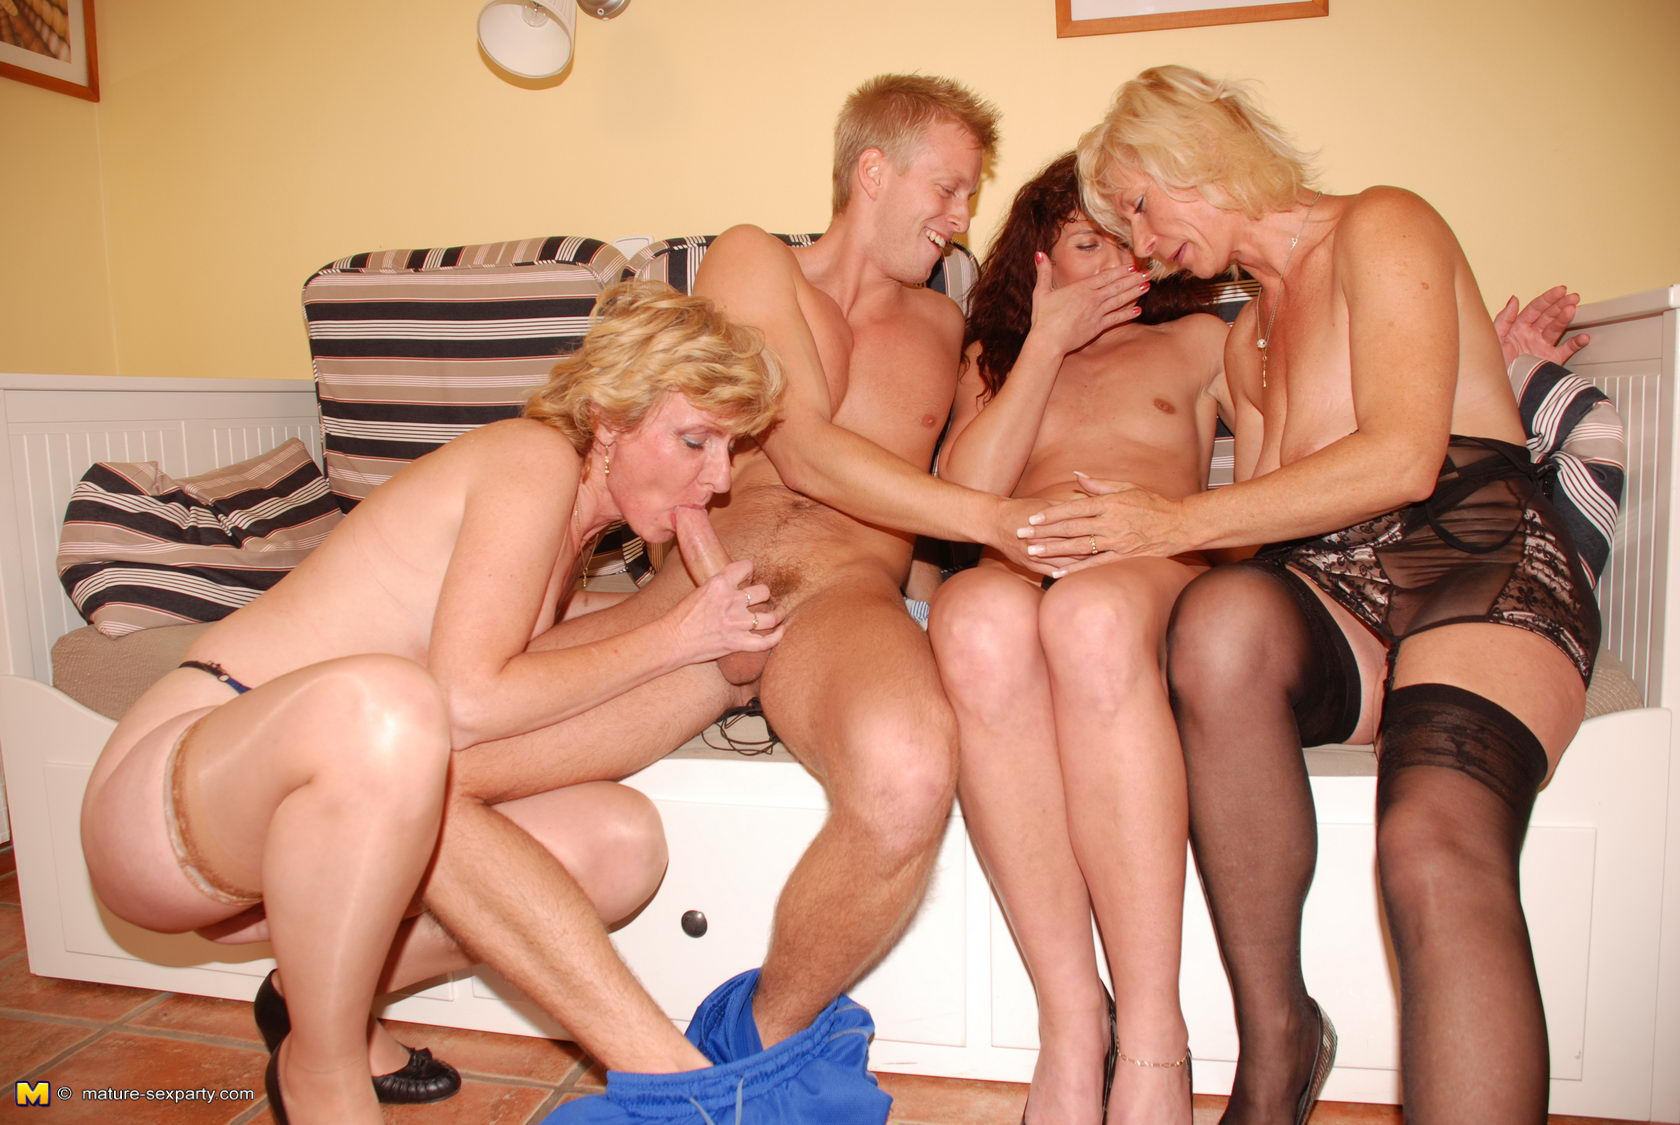 Секс онлайн ицест русский 3 фотография